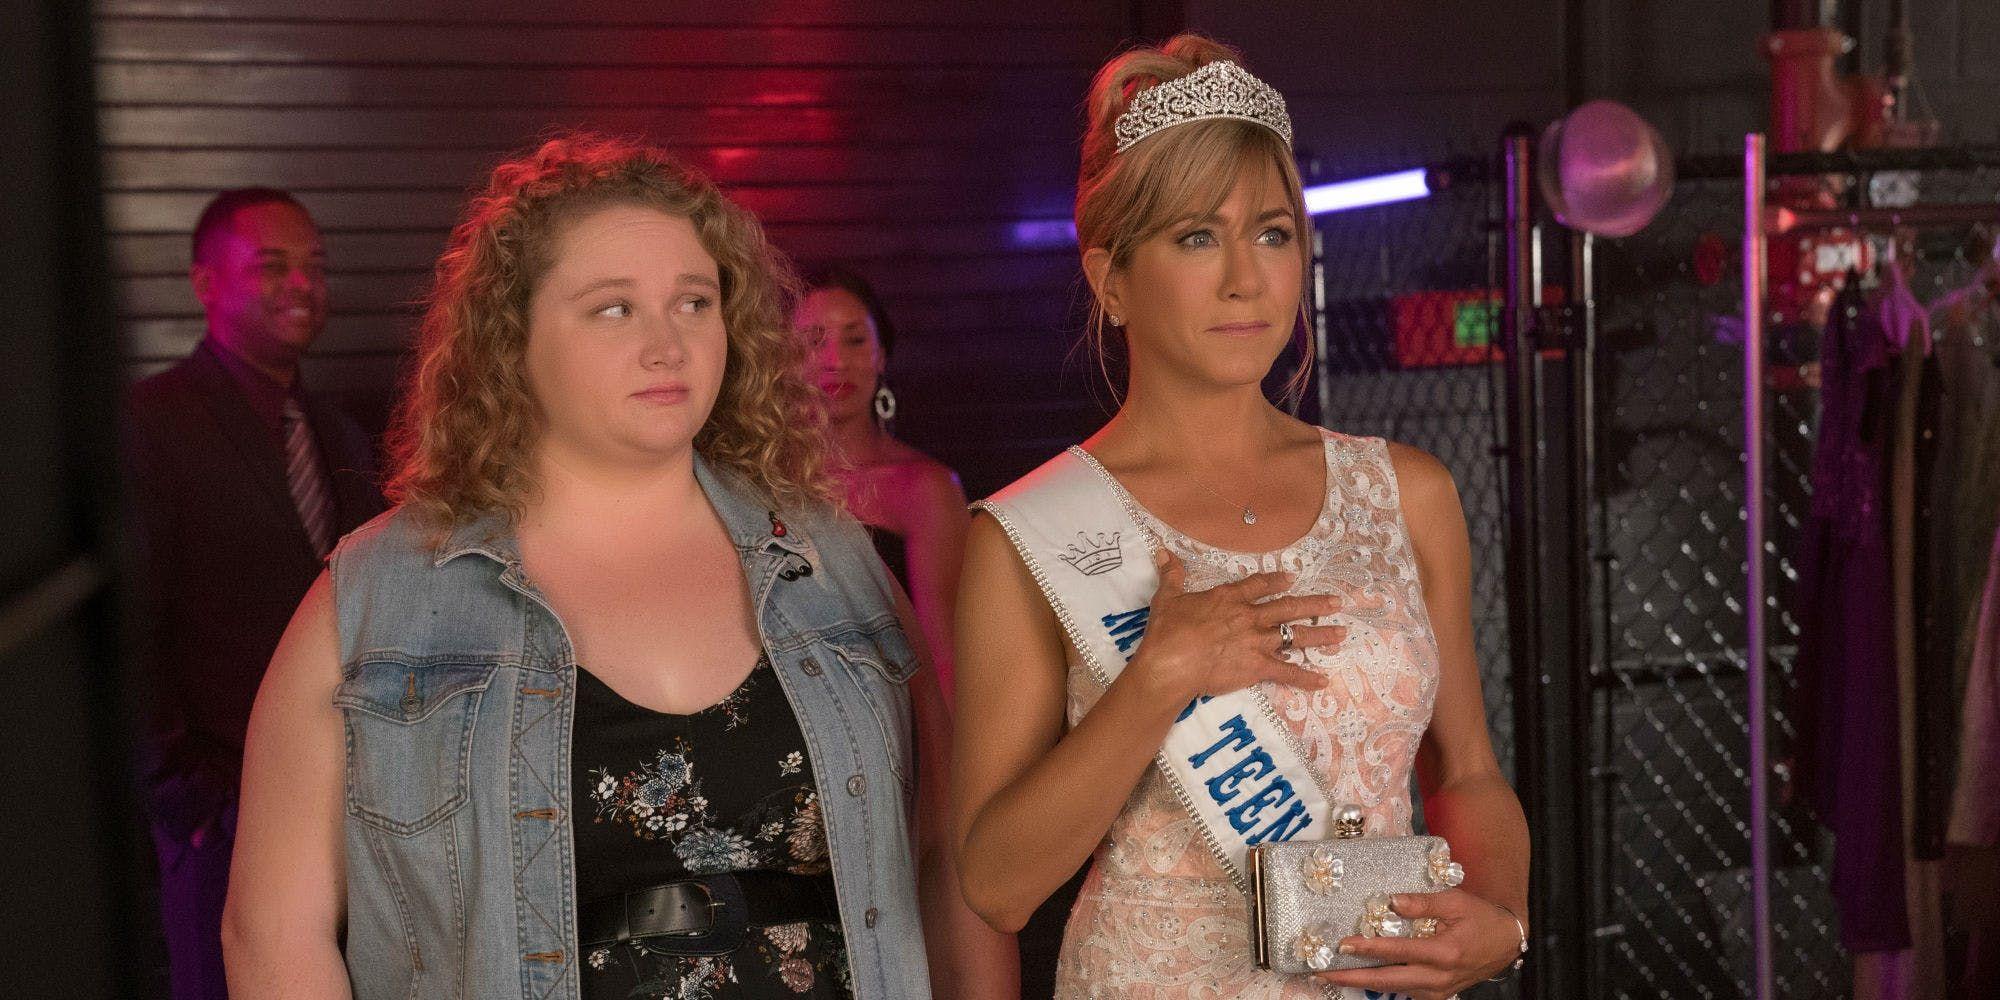 Tráiler de 'Dumplin', la nueva comedia de Jennifer Aniston para Netflix - Así es la nueva película de Jennifer Aniston